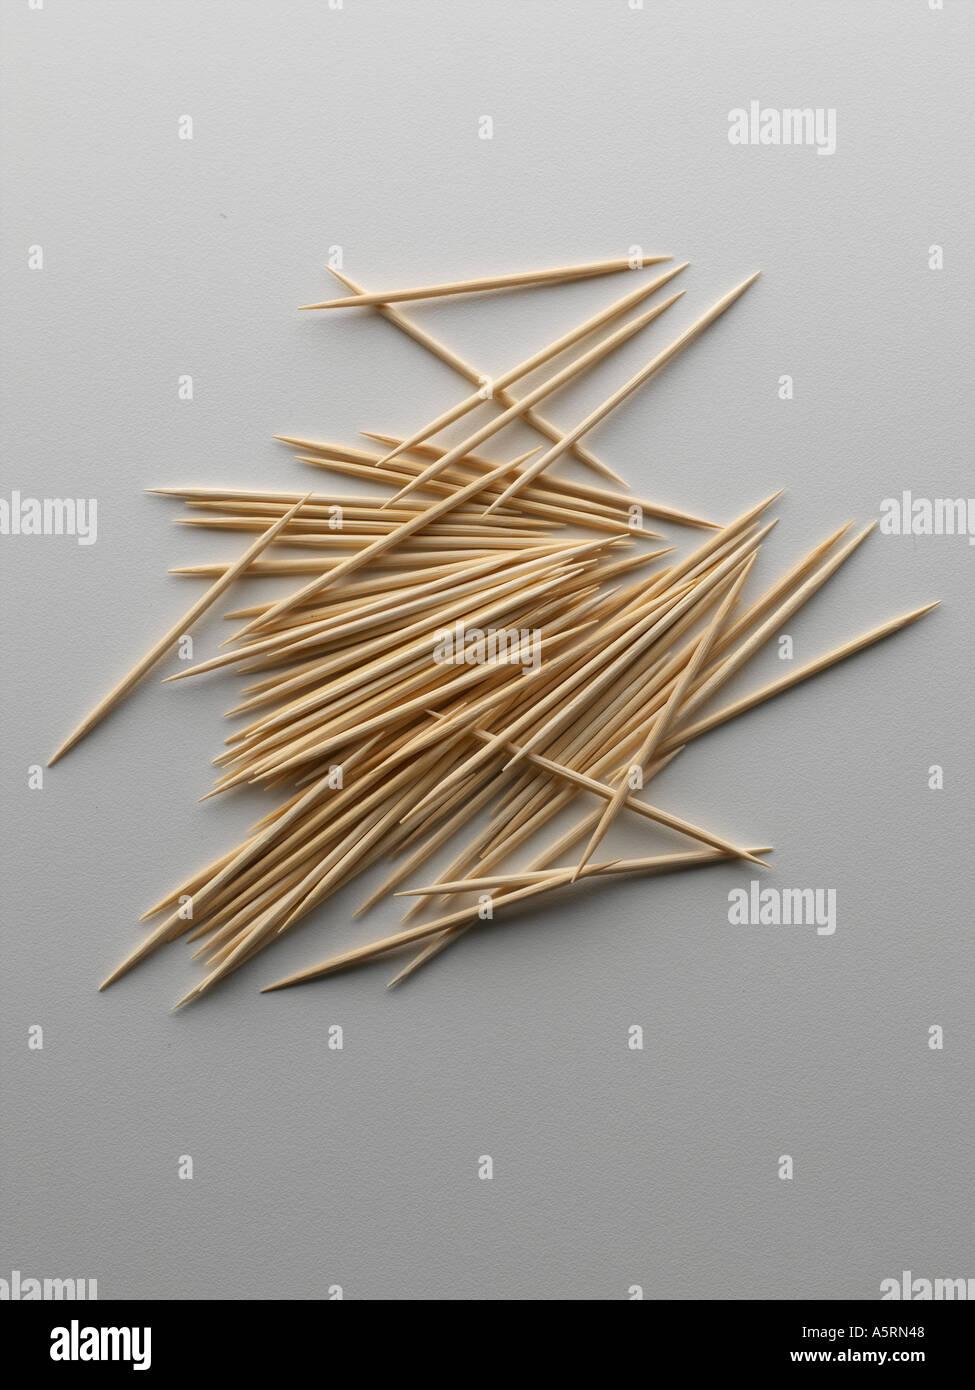 close up toothpicks - Stock Image